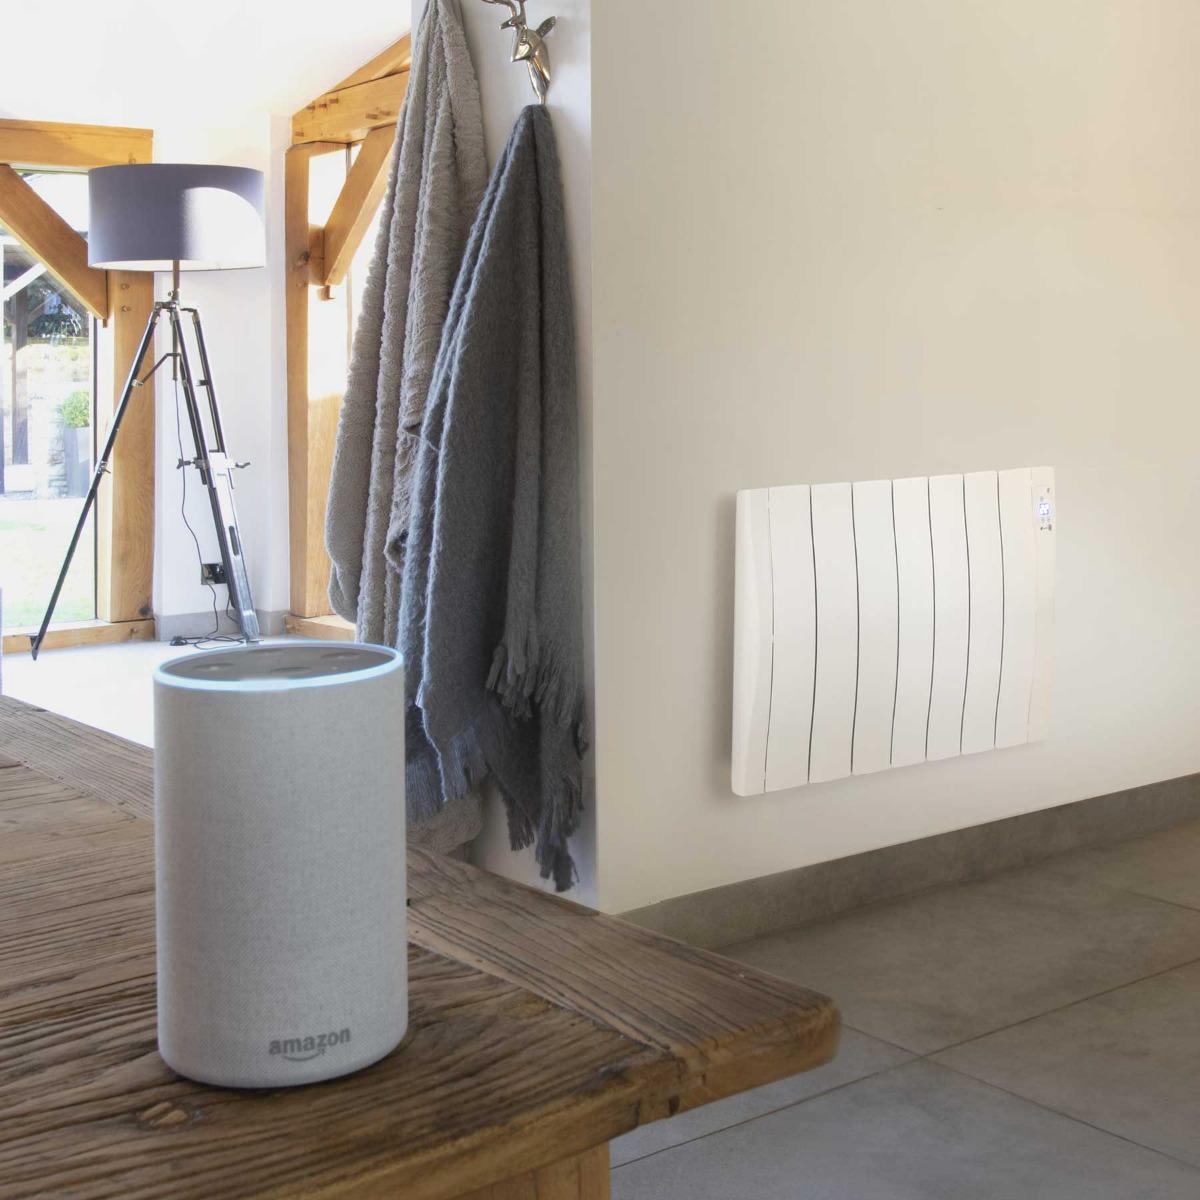 Haverland SmartWave Electric Radiator